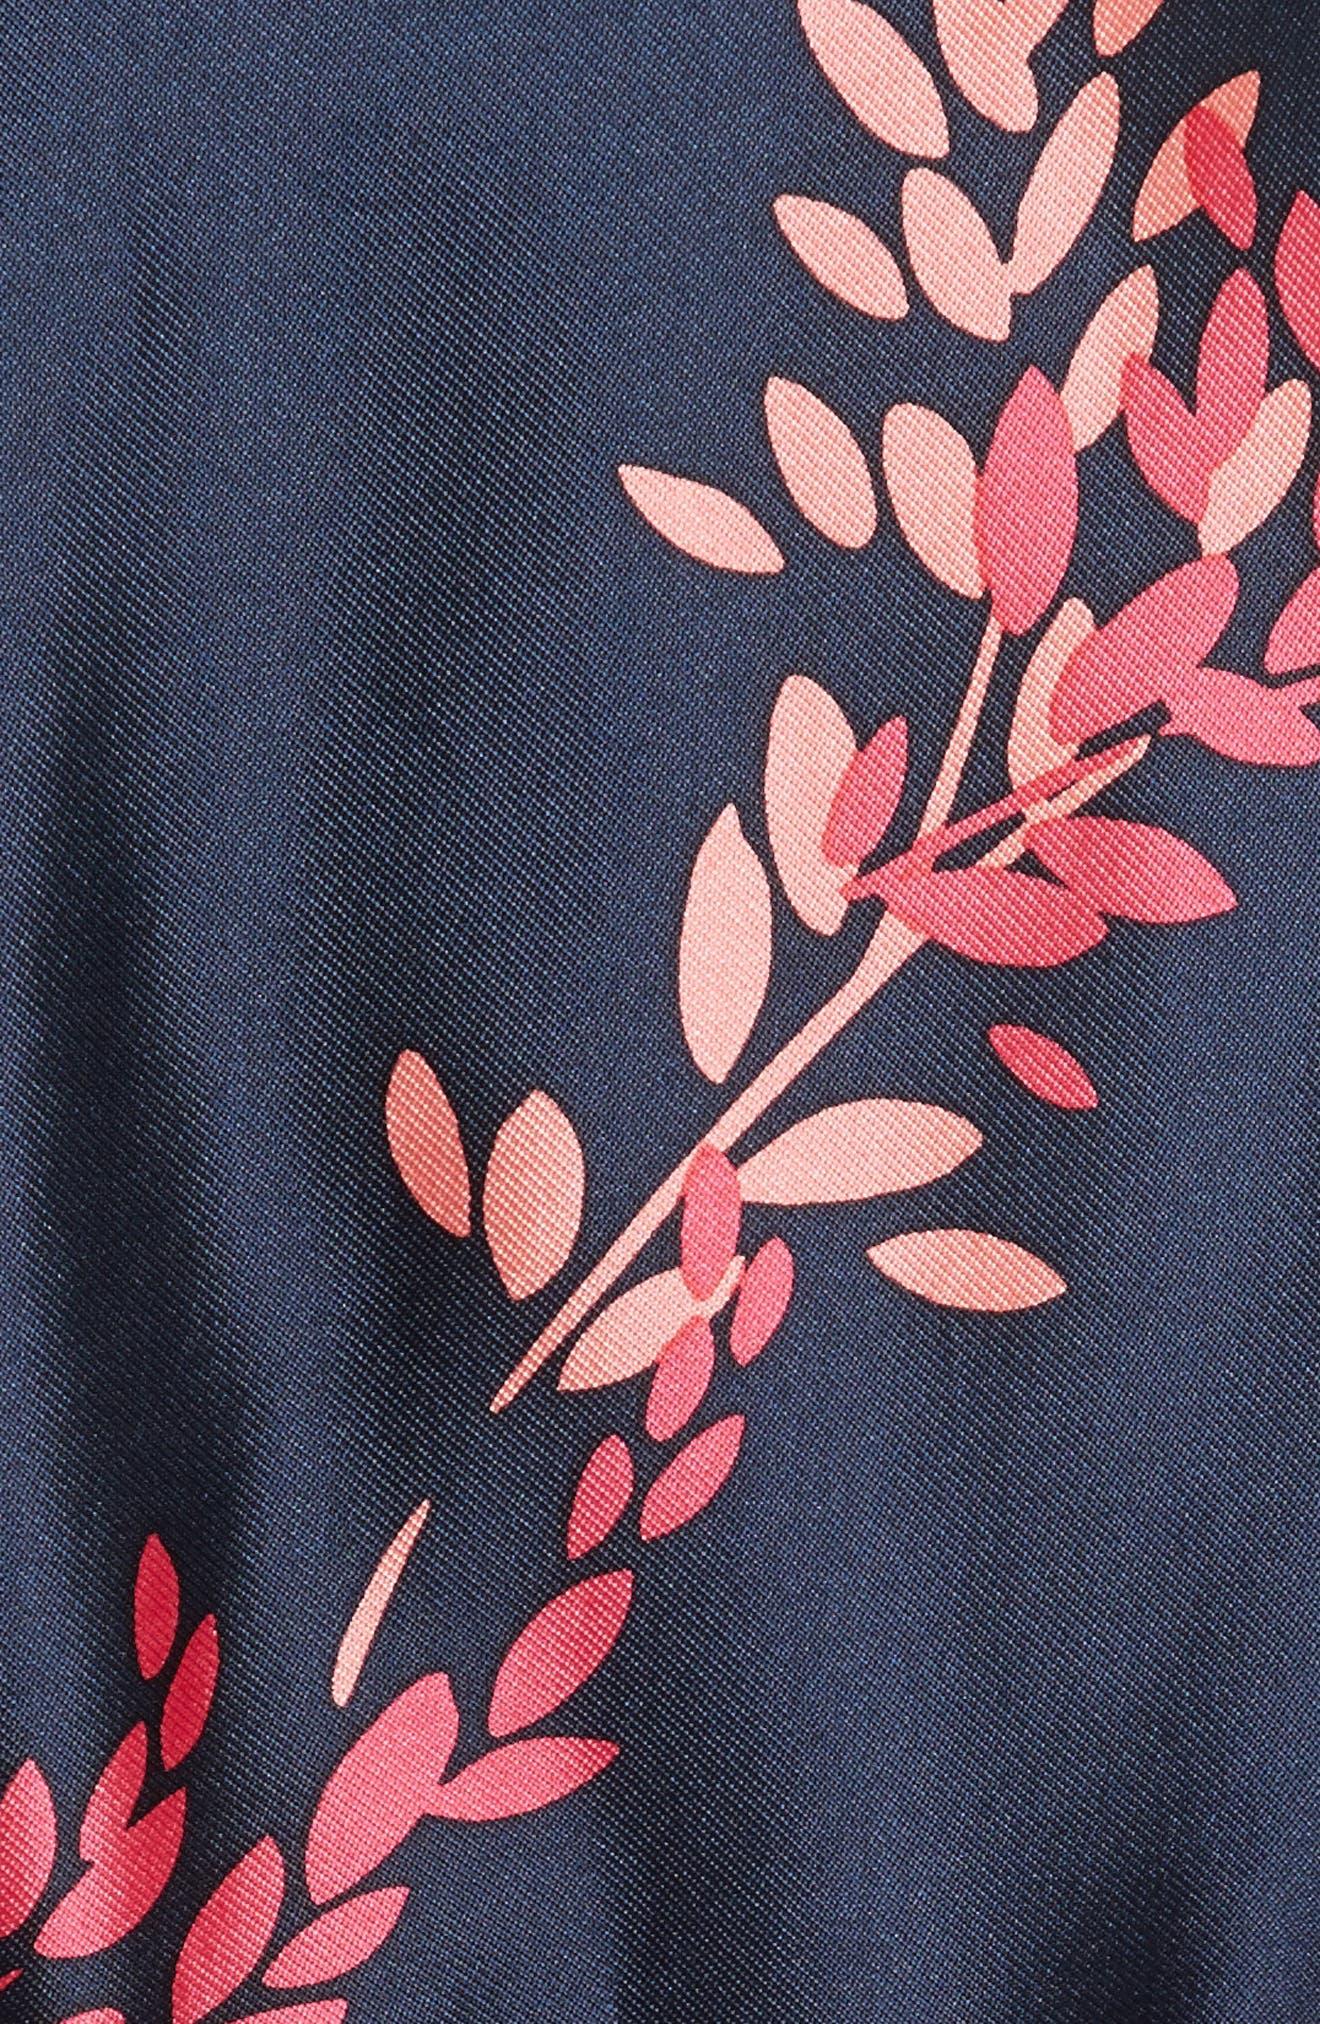 Leaf Print Silk & Cotton Dress,                             Alternate thumbnail 6, color,                             415